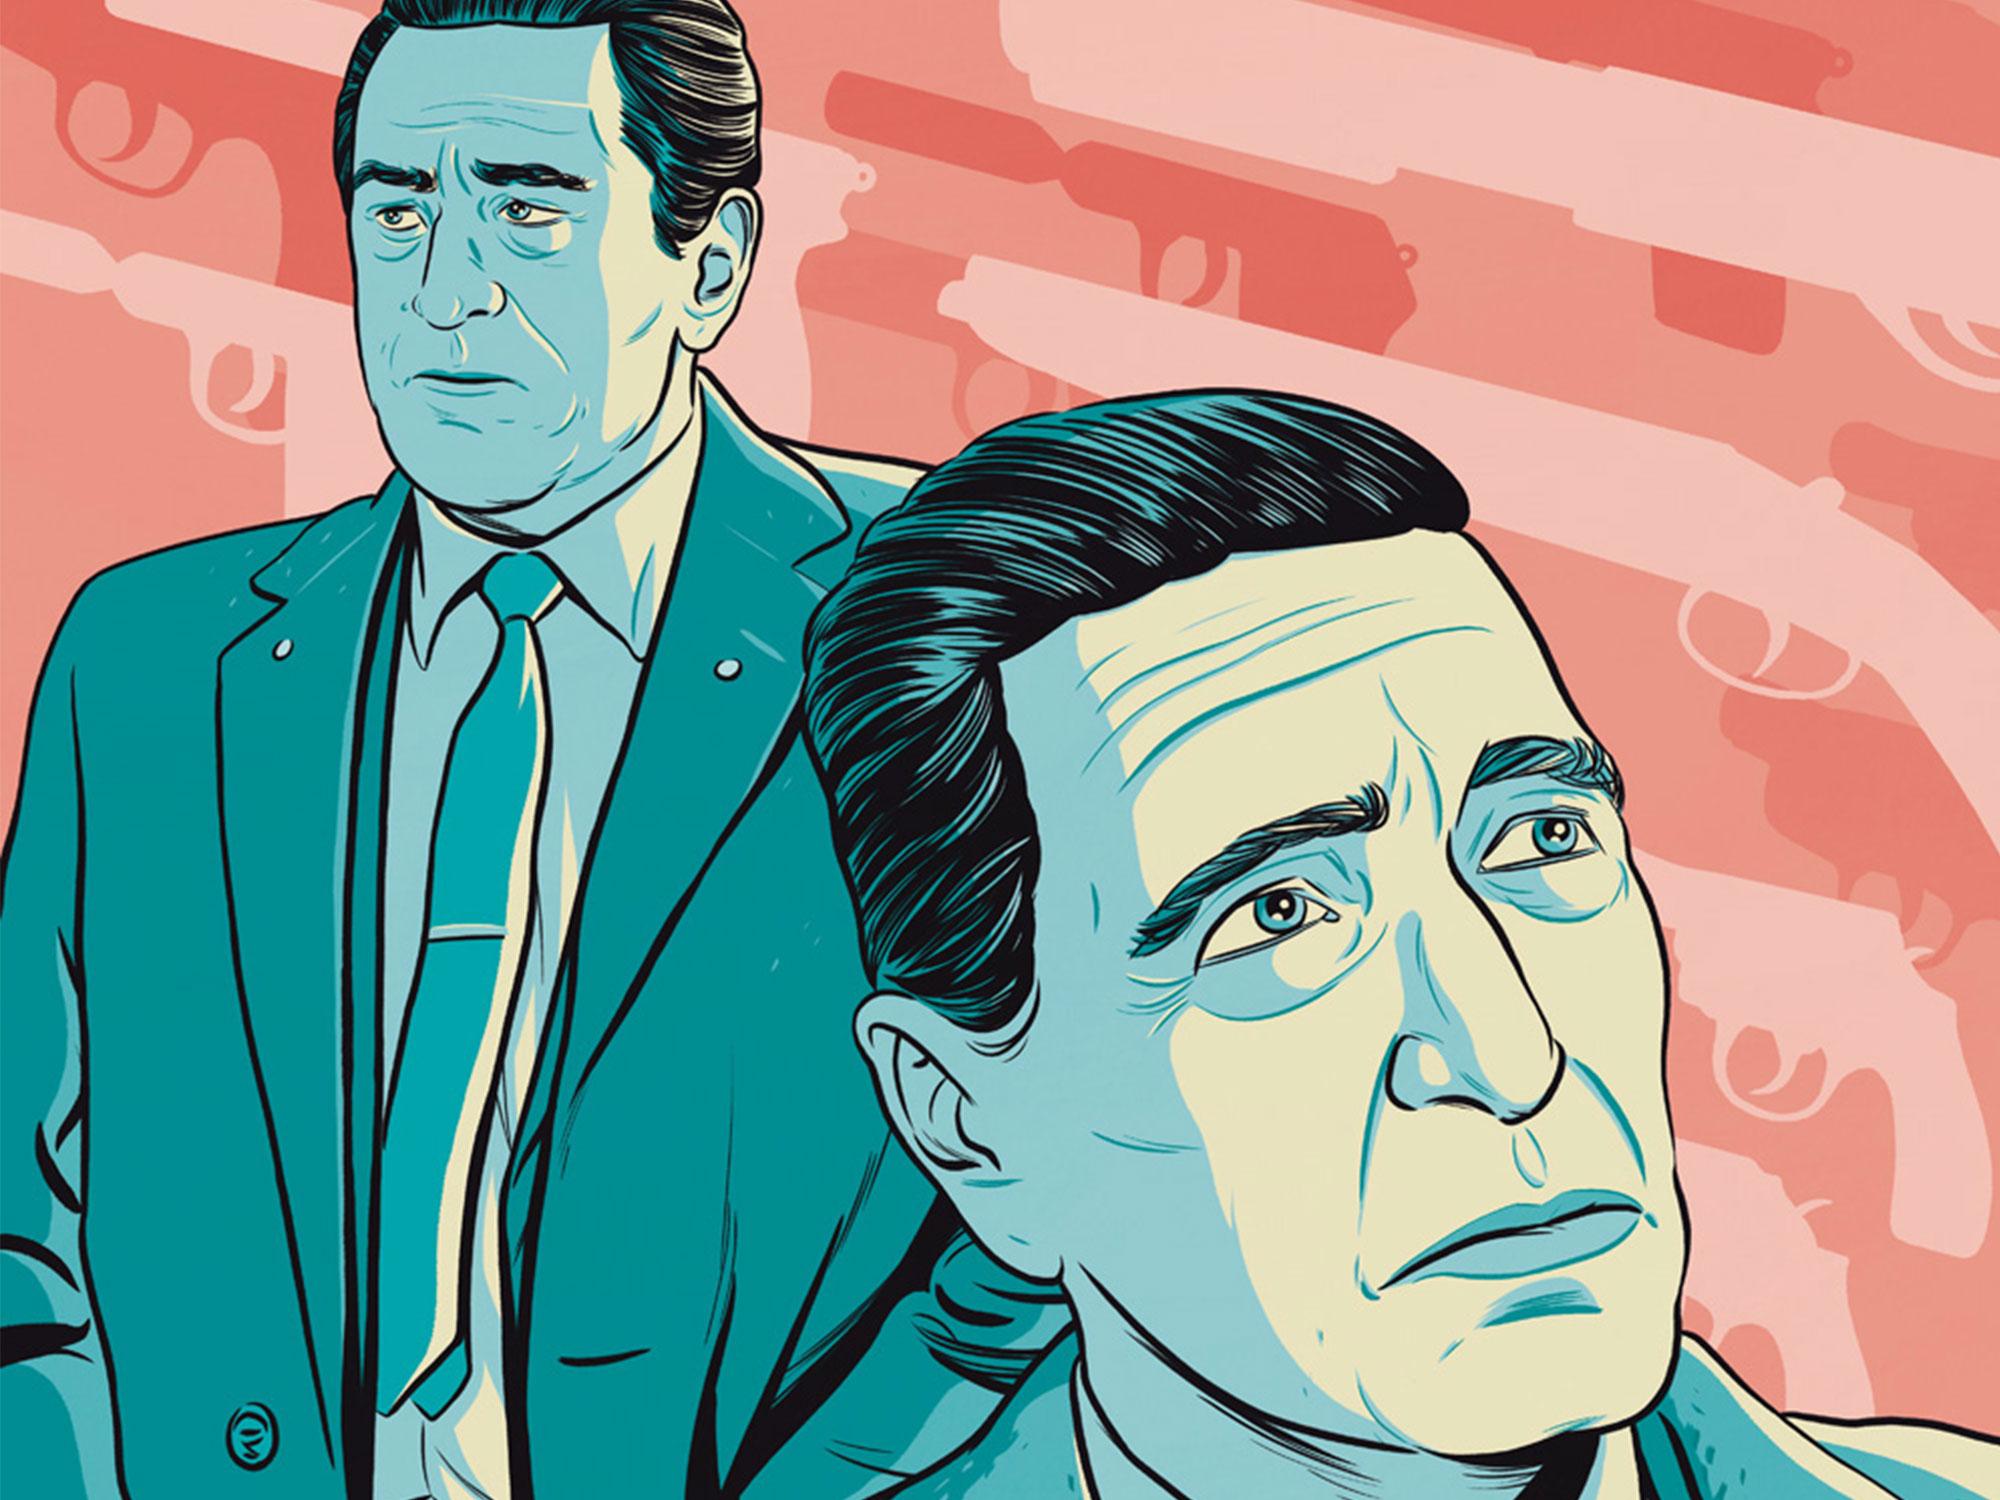 De Niro and Pacino on The Irishman and the gangsterization of US politics